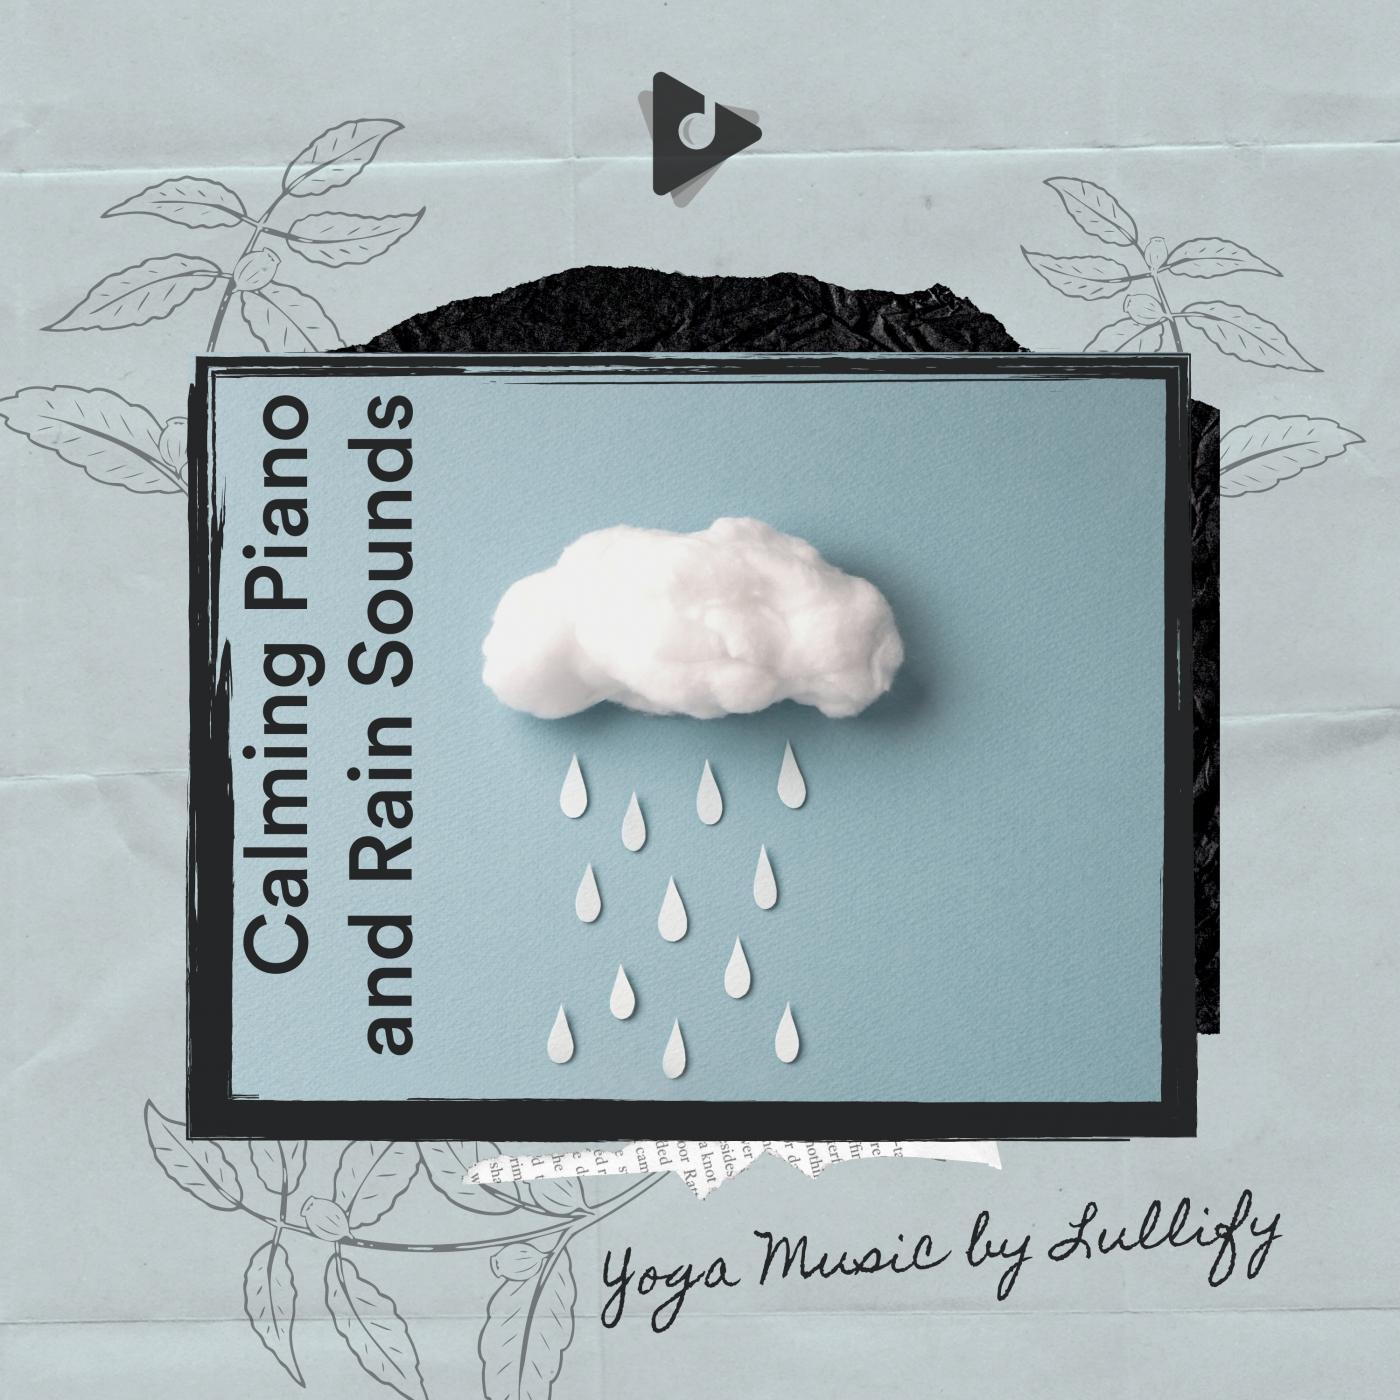 Calming Piano and Rain Sounds